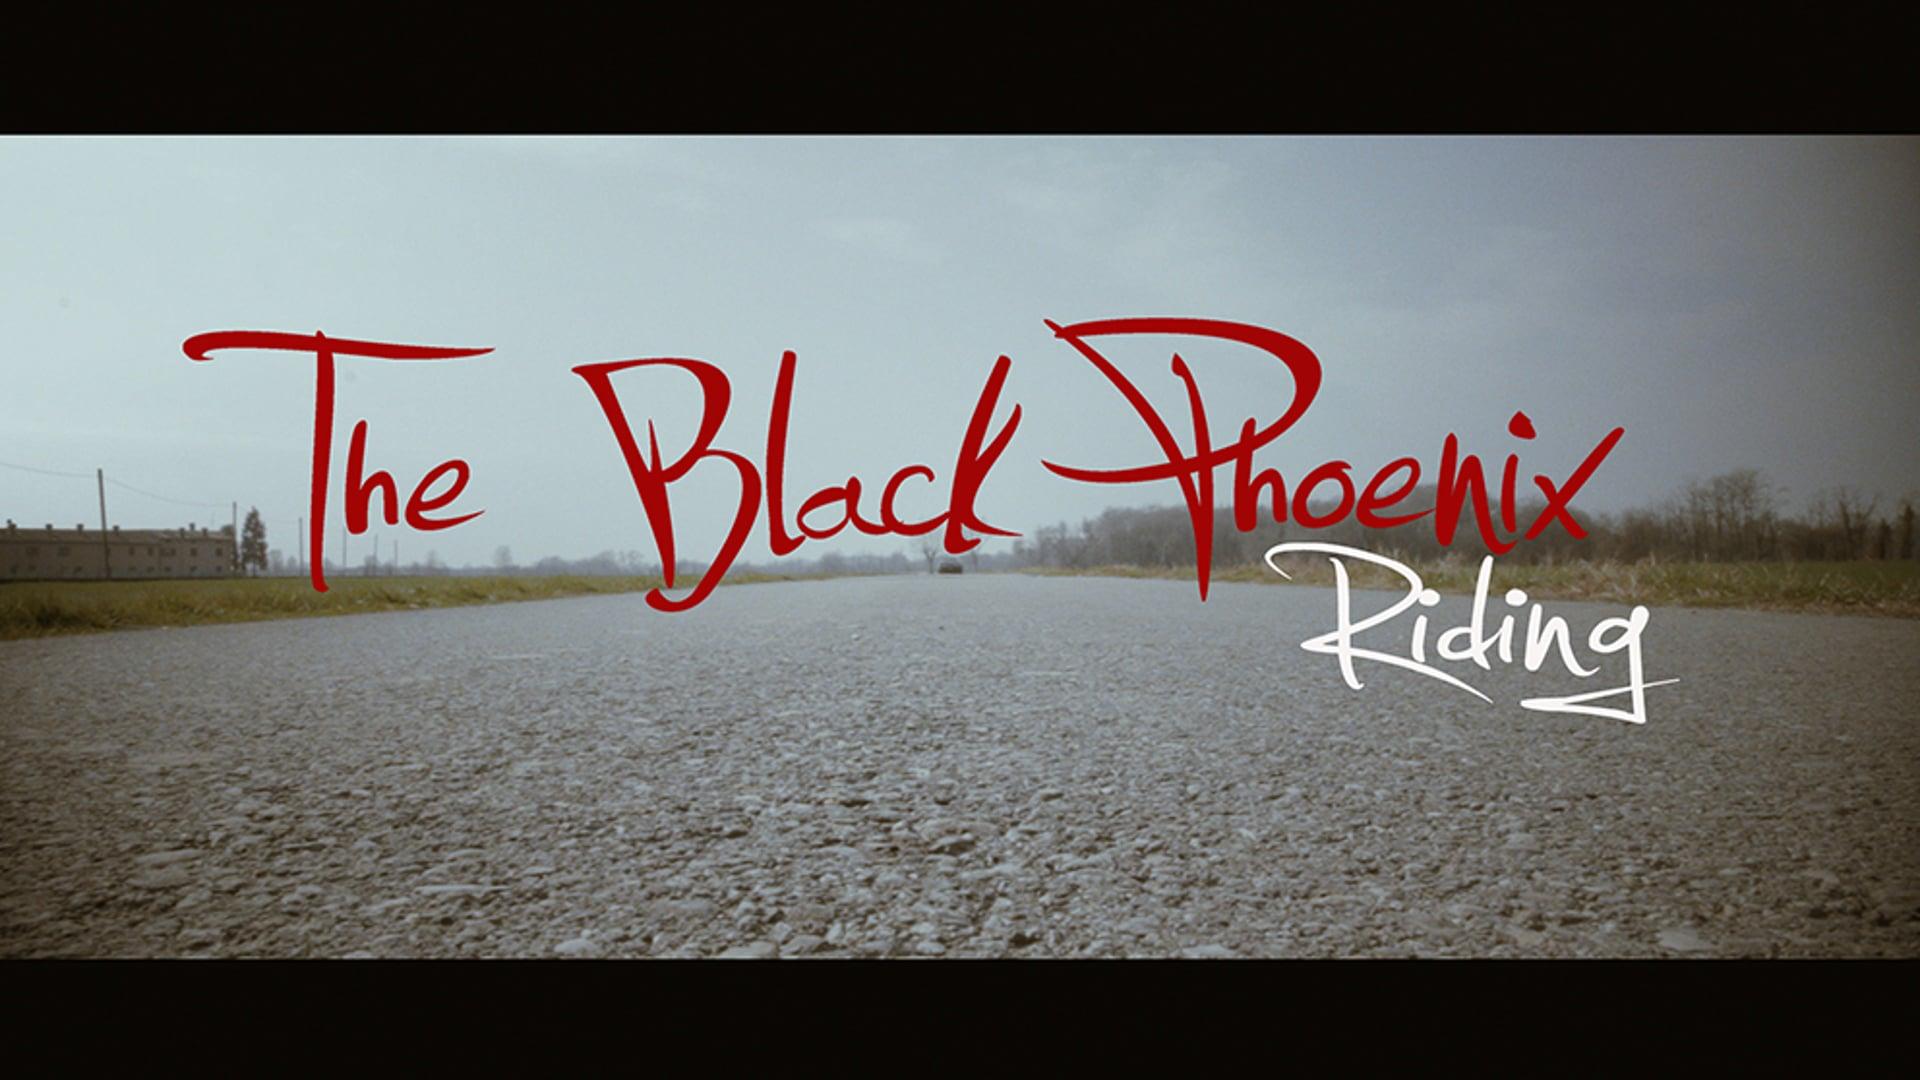 The Black Phoenix - Riding